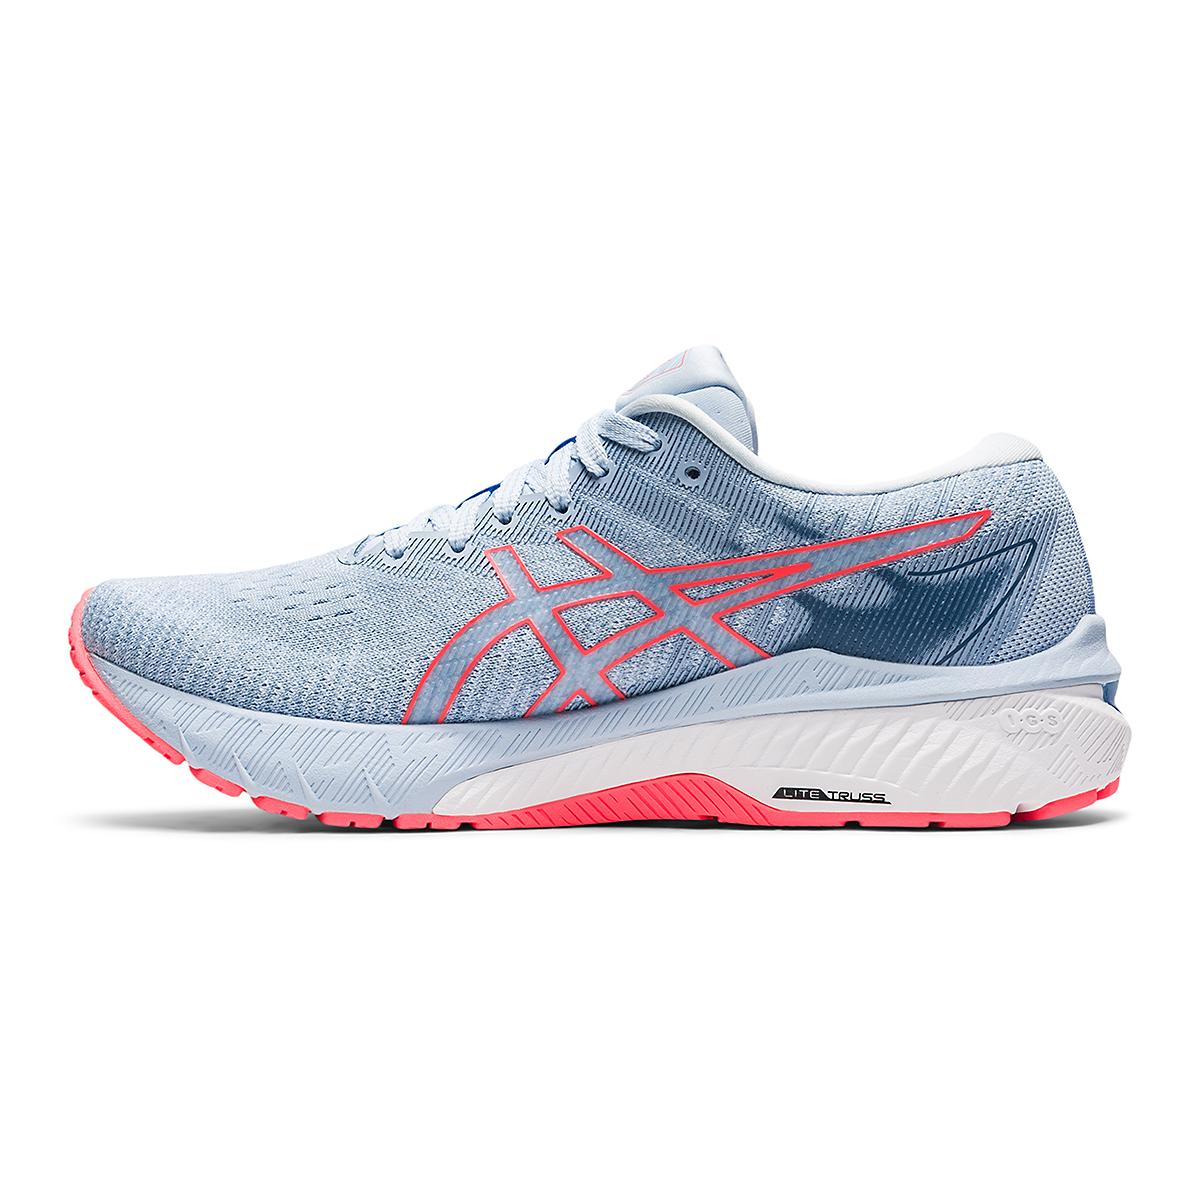 Women's Asics GT-2000 10 Running Shoe - Color: Mist/Blazing Coral - Size: 5 - Width: Regular, Mist/Blazing Coral, large, image 2